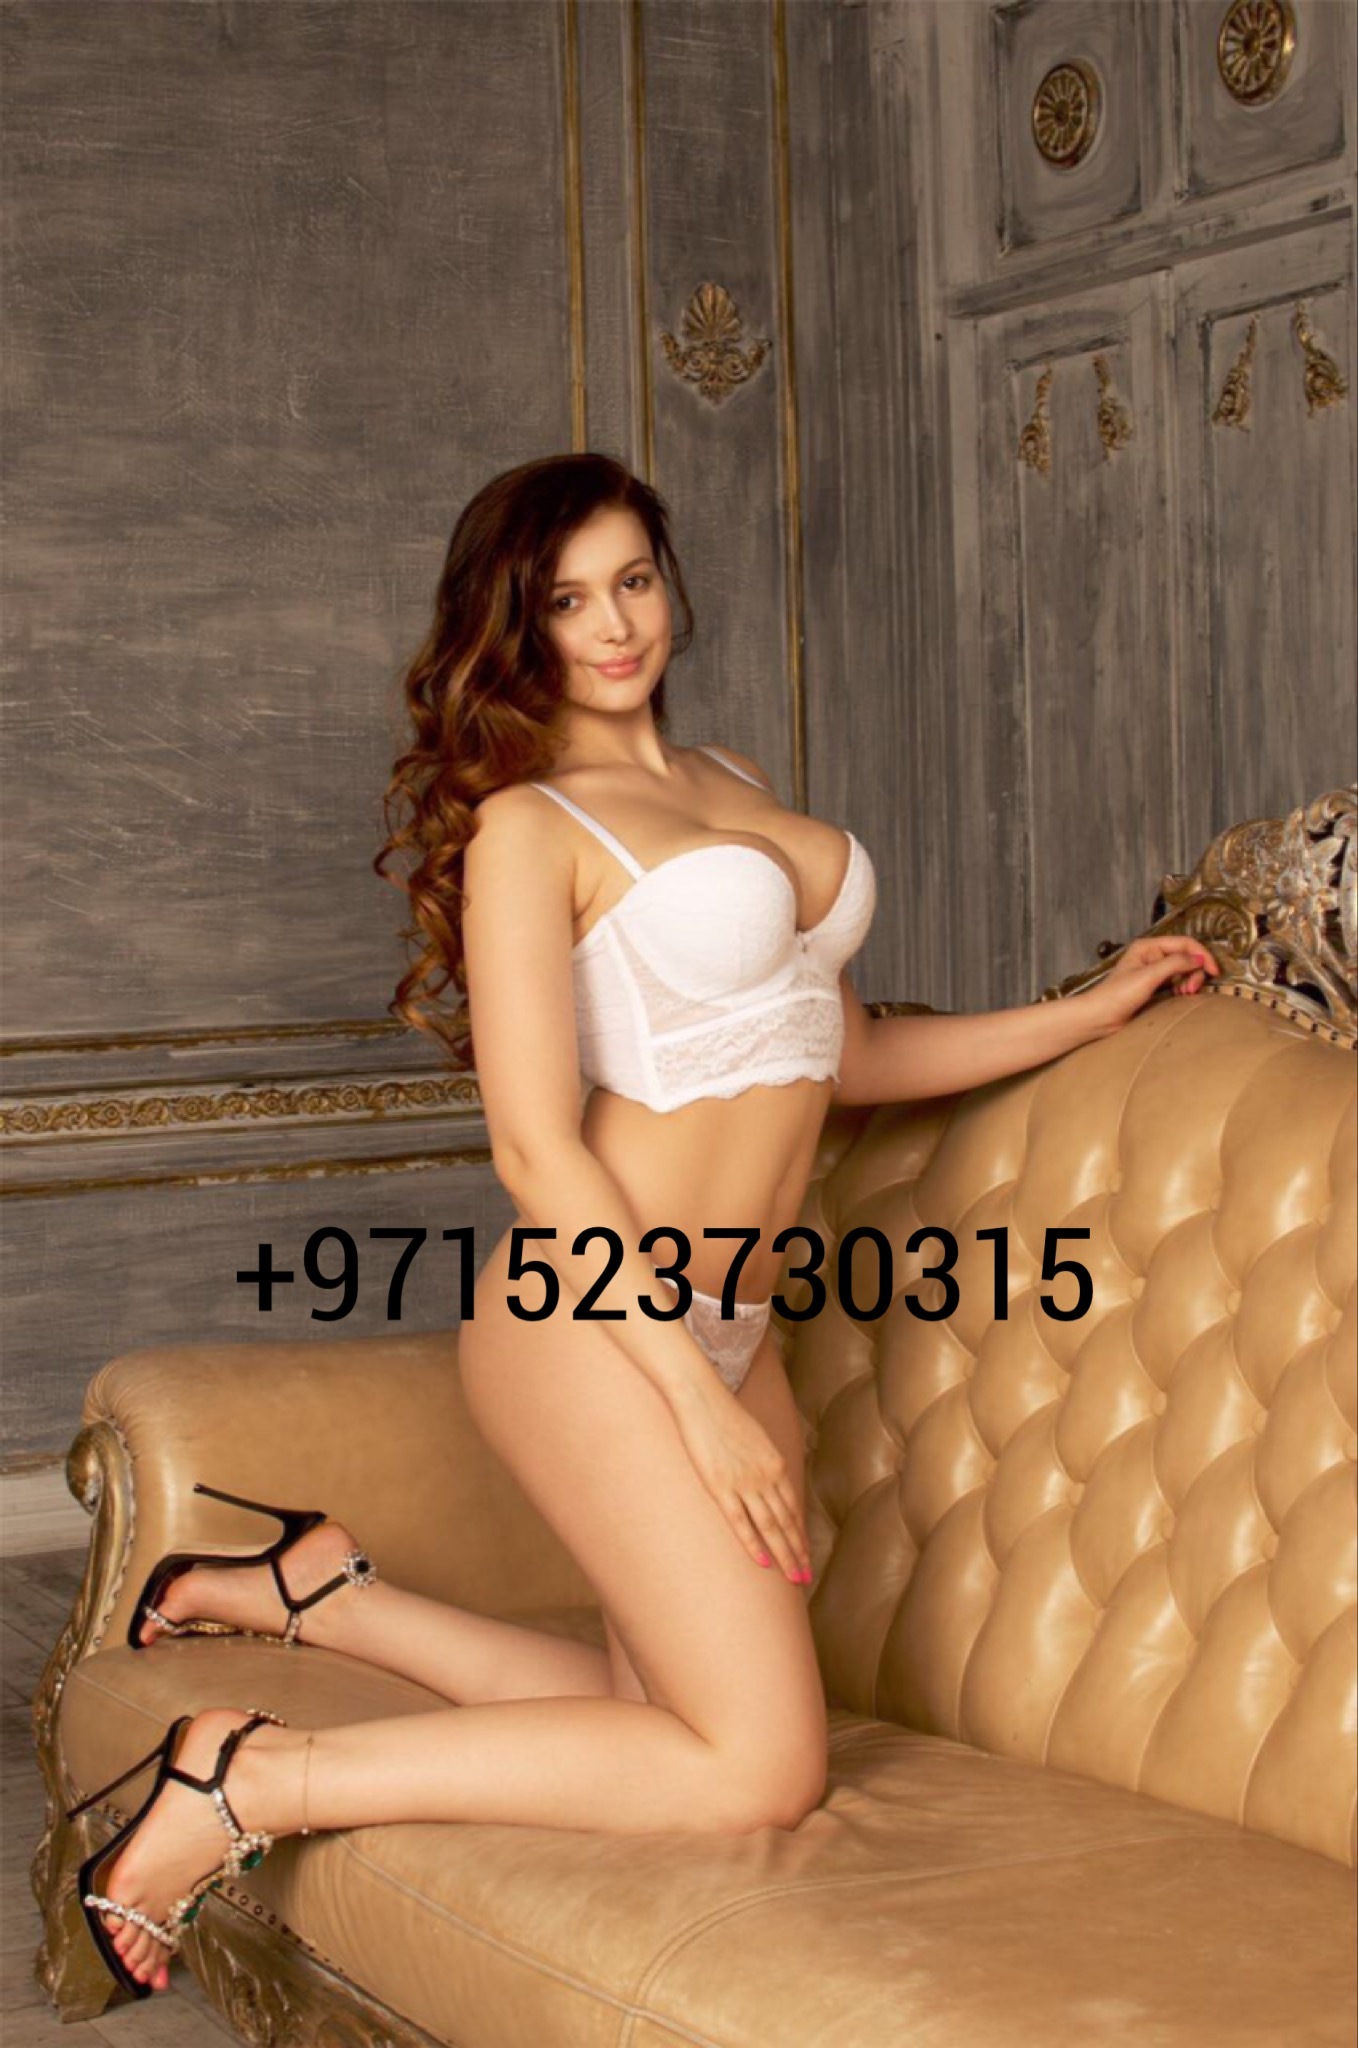 Luckmali, sex i Motala - 2821